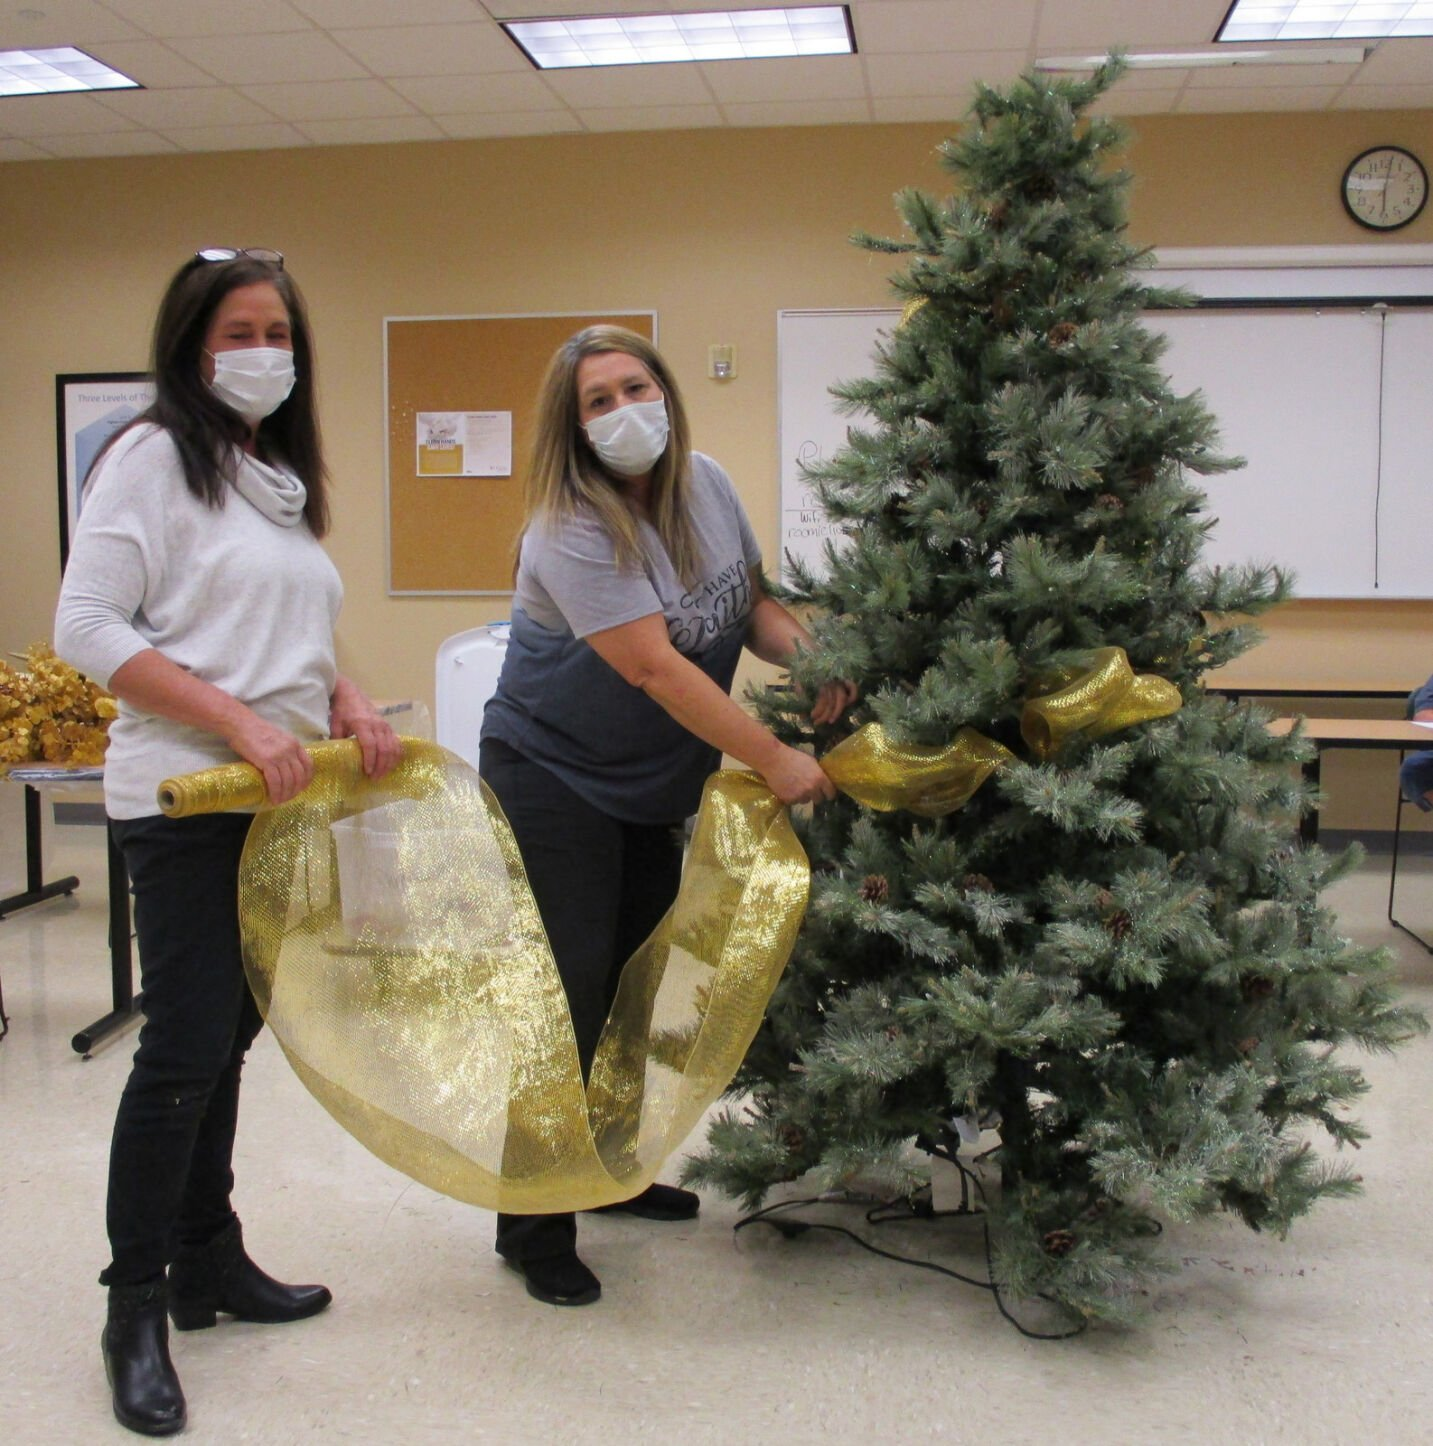 Ribbons Bow Ornaments Mesh Add To Spirit Of Seasonal Favorite The Christmas Livingston Tangipahoa Theadvocate Com